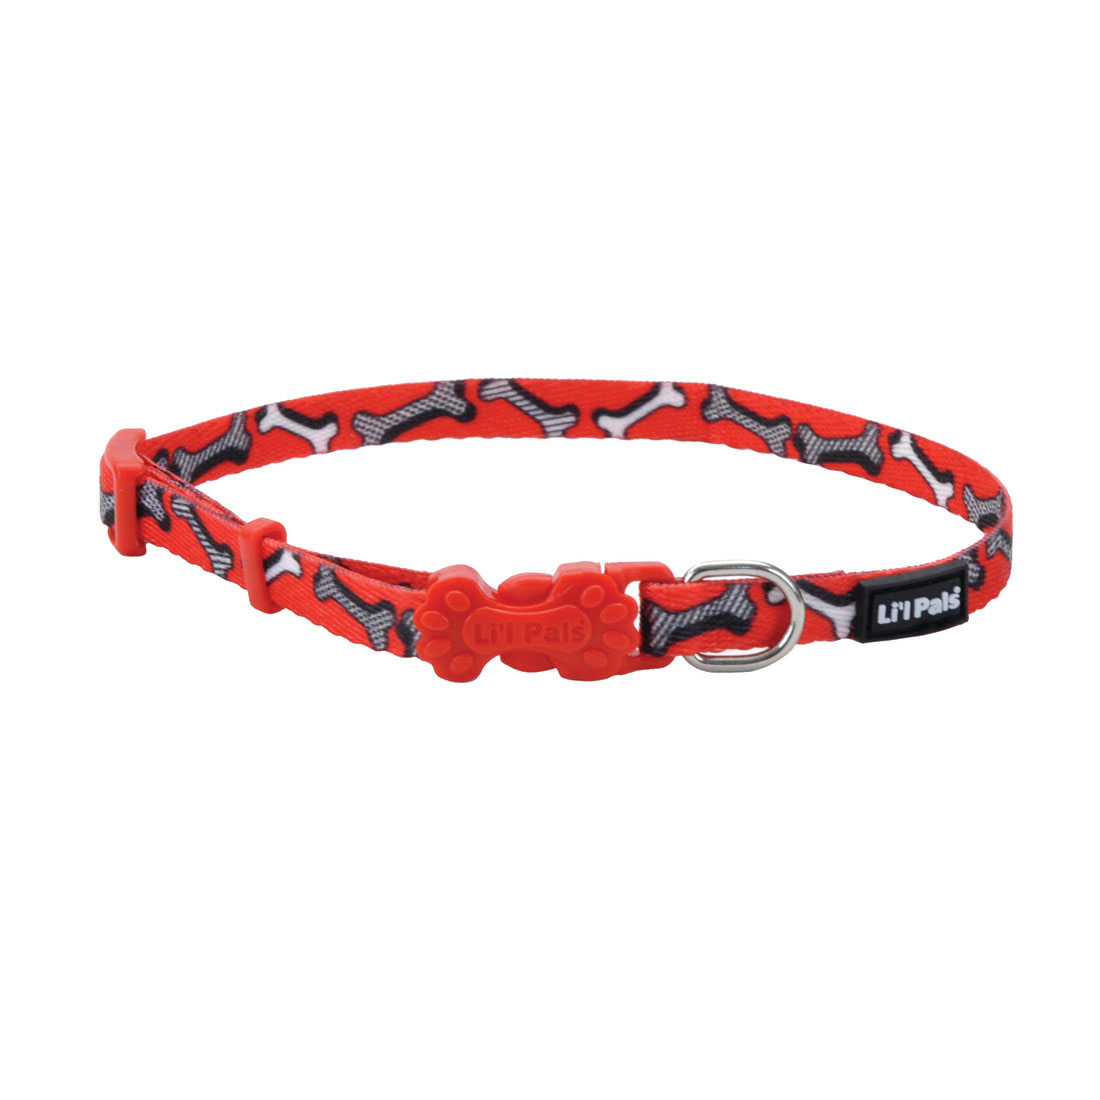 Coastal Pet Products 06622 RWB12